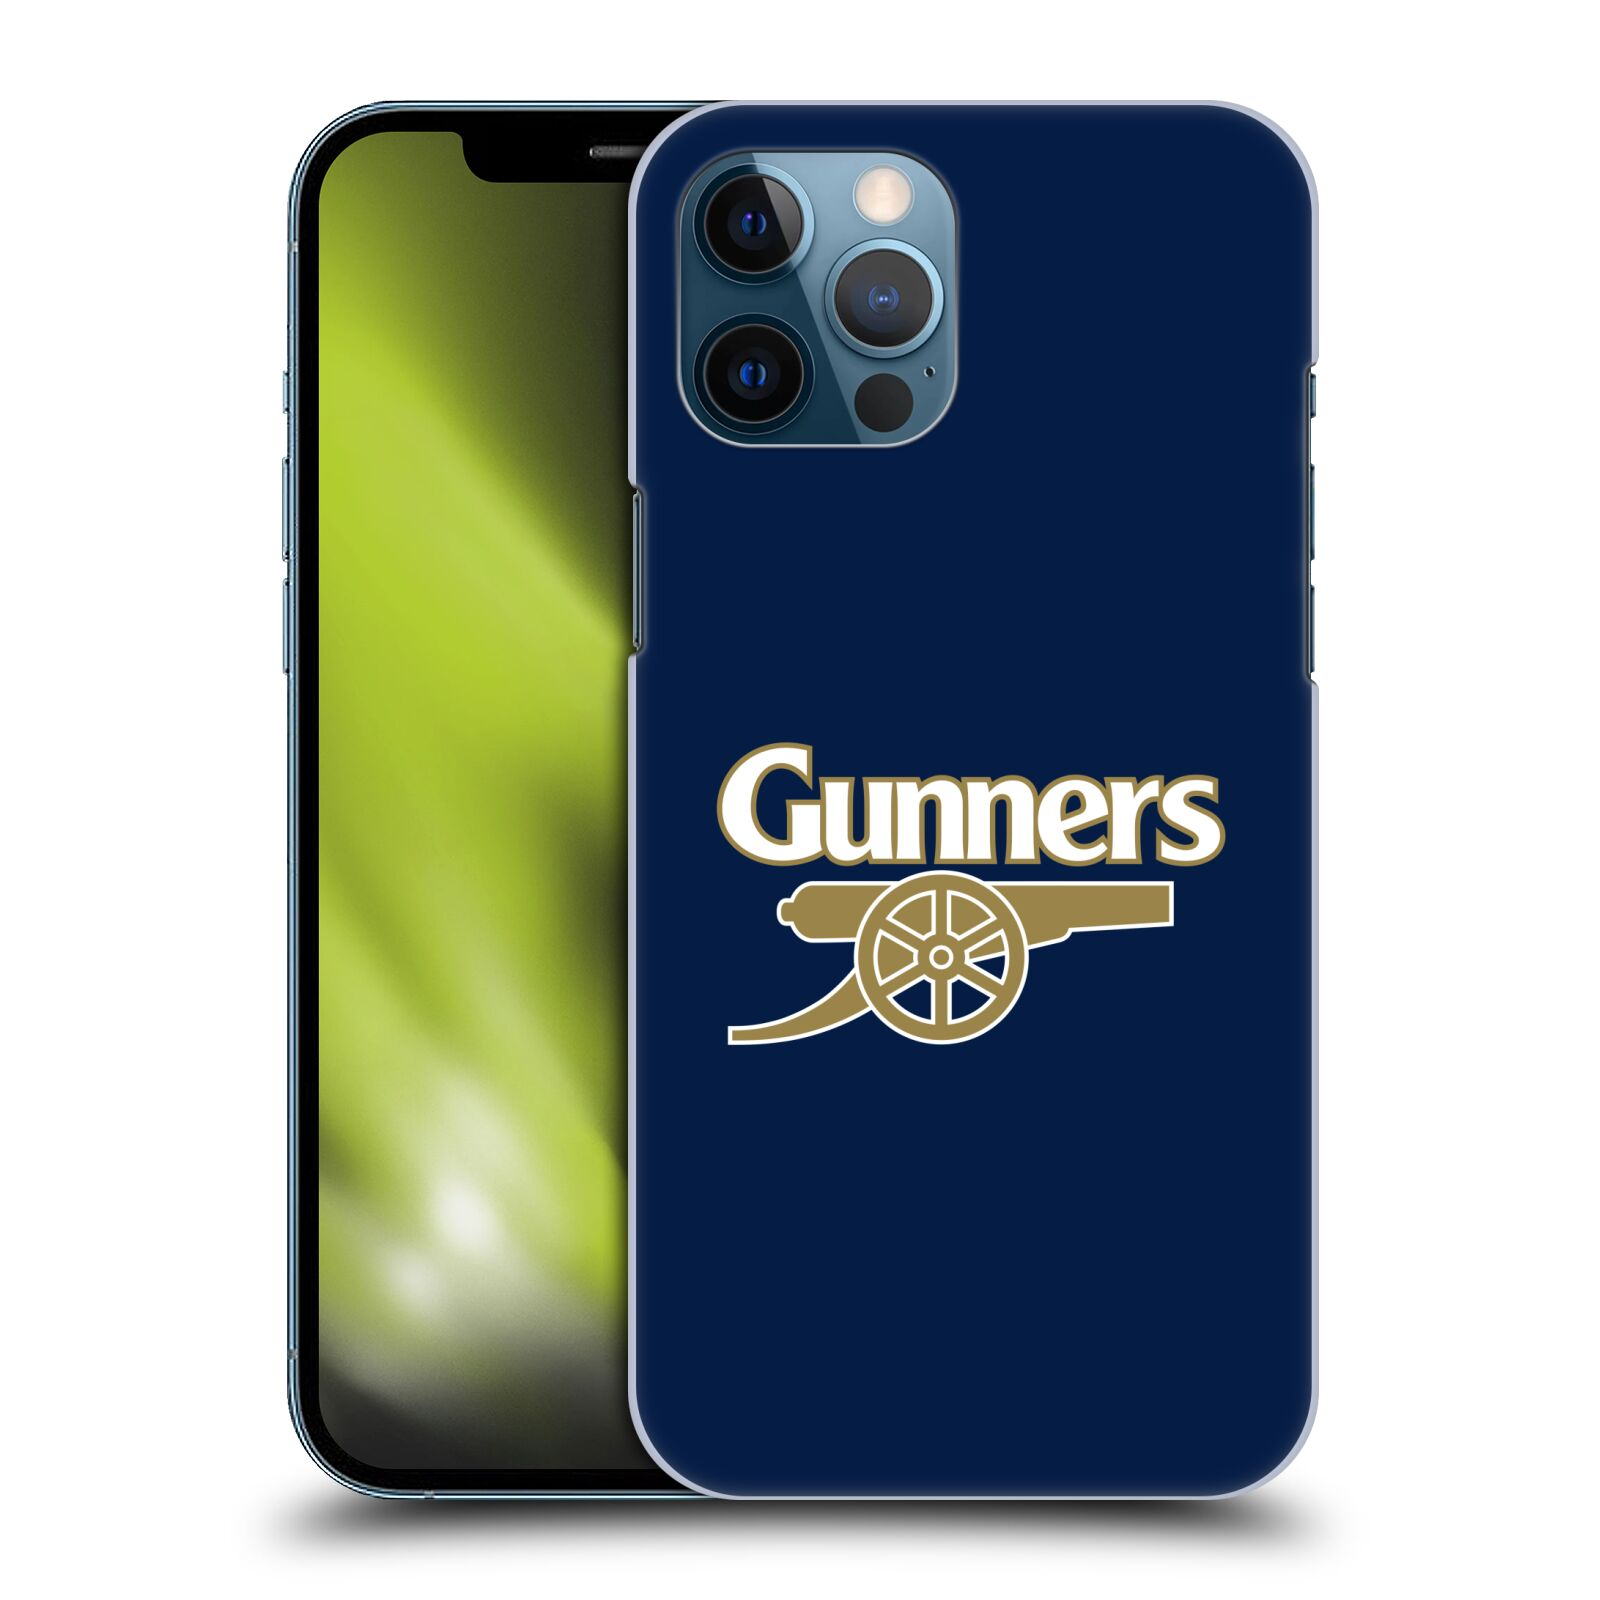 Plastové pouzdro na mobil Apple iPhone 12 Pro Max - Head Case - Arsenal FC - Gunners